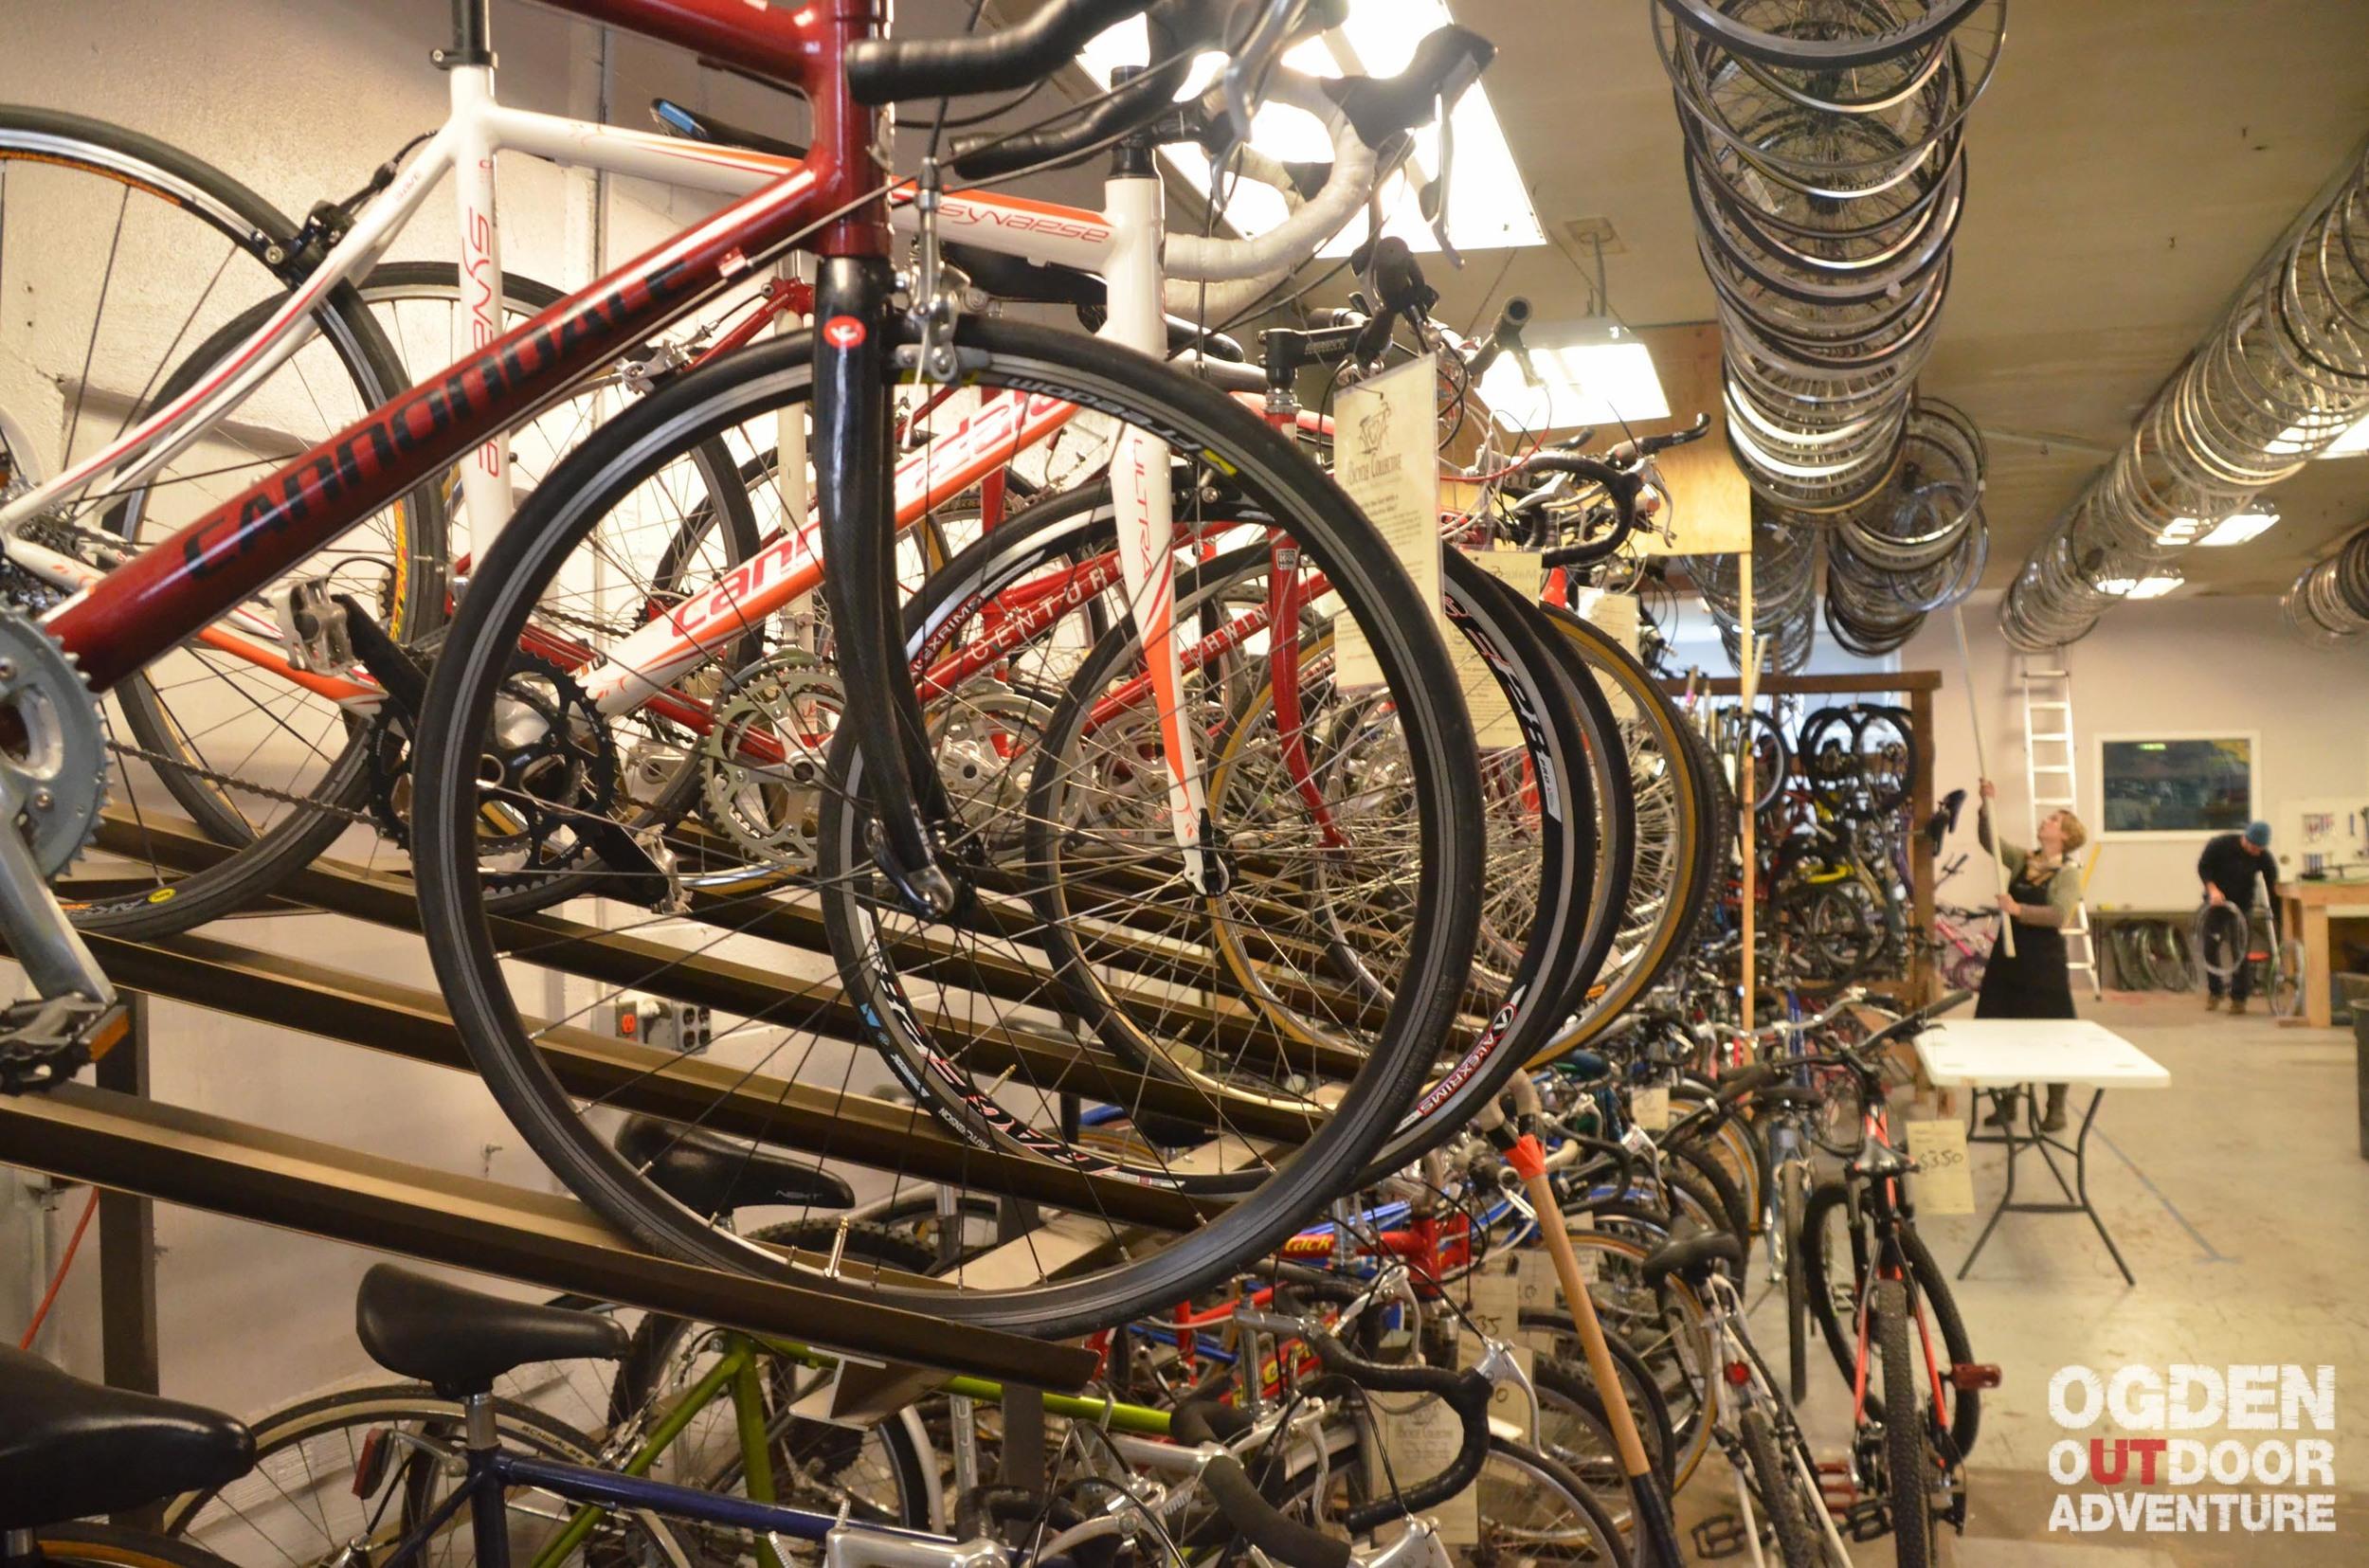 The Ogden Bike Collective